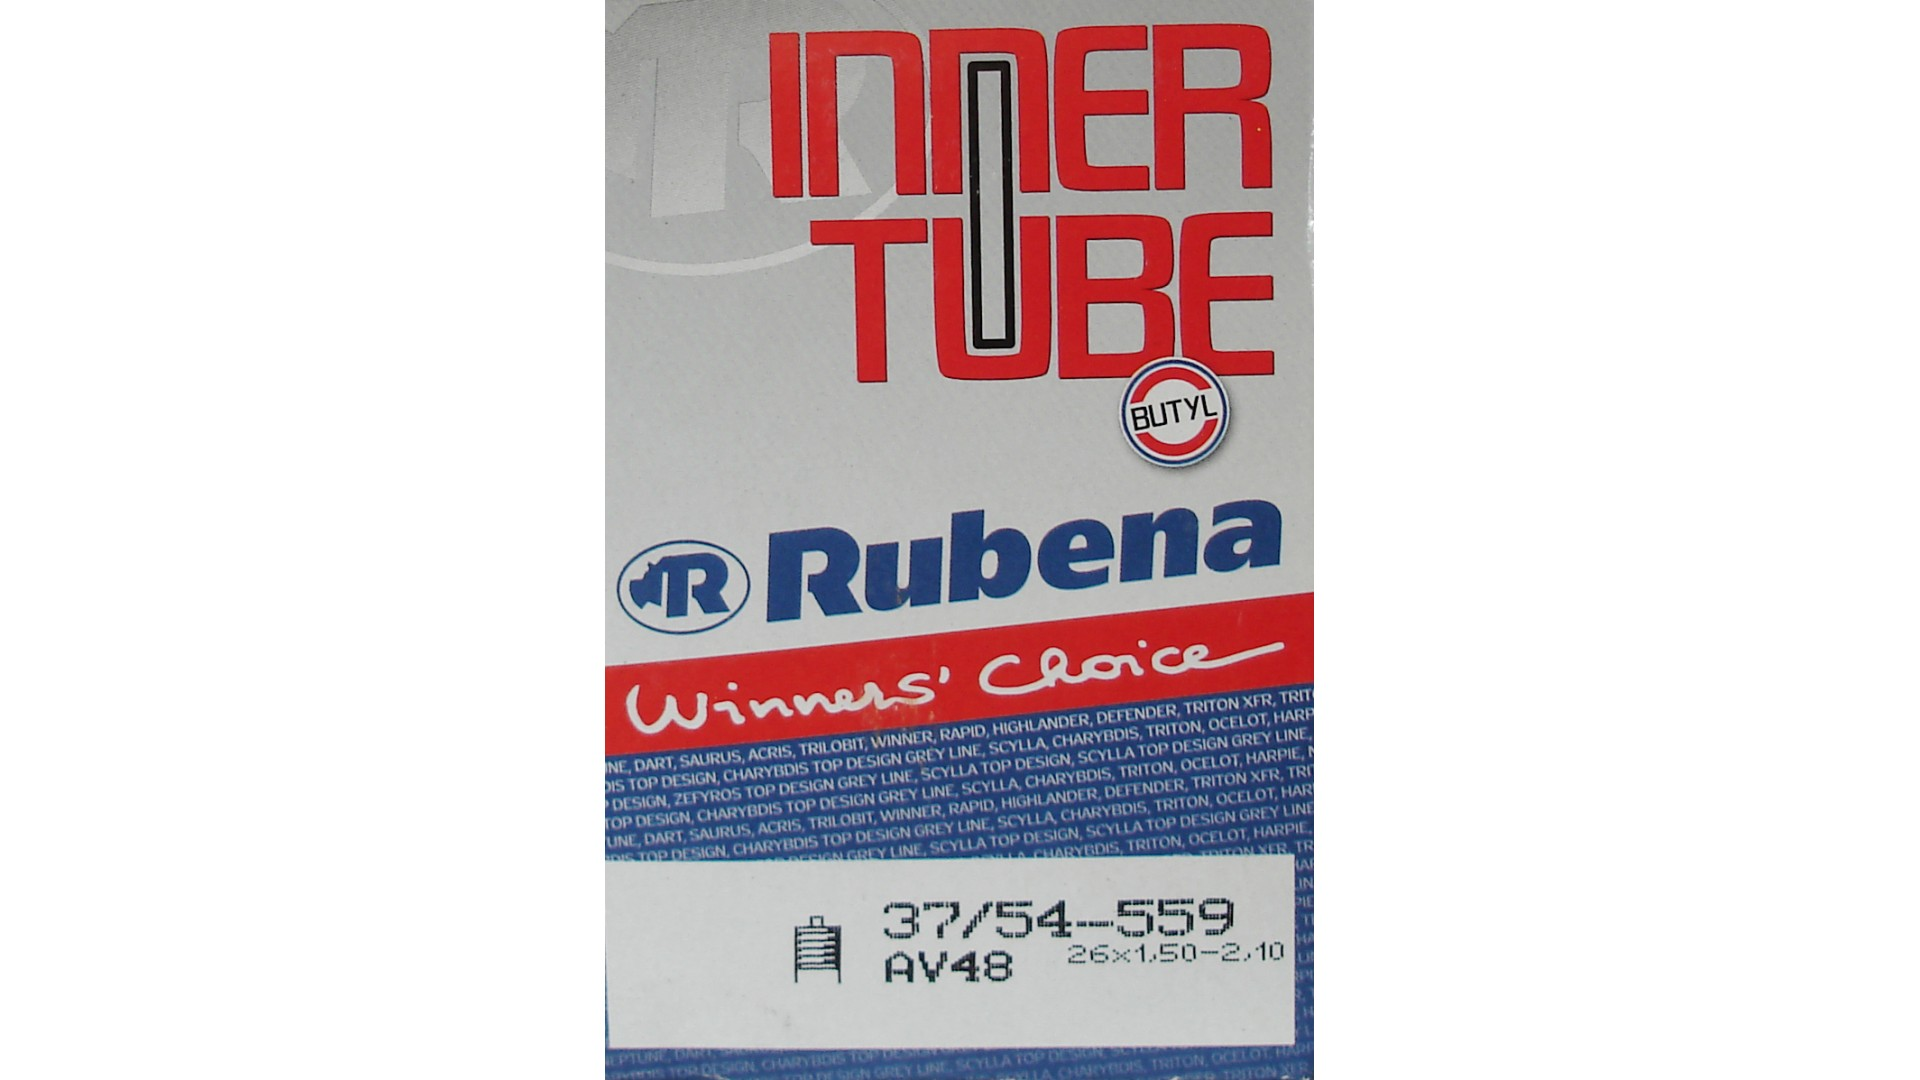 Камера RUBENA 26 x 1.50-2.10 a/v 48мм D07 BSC 0.9mm